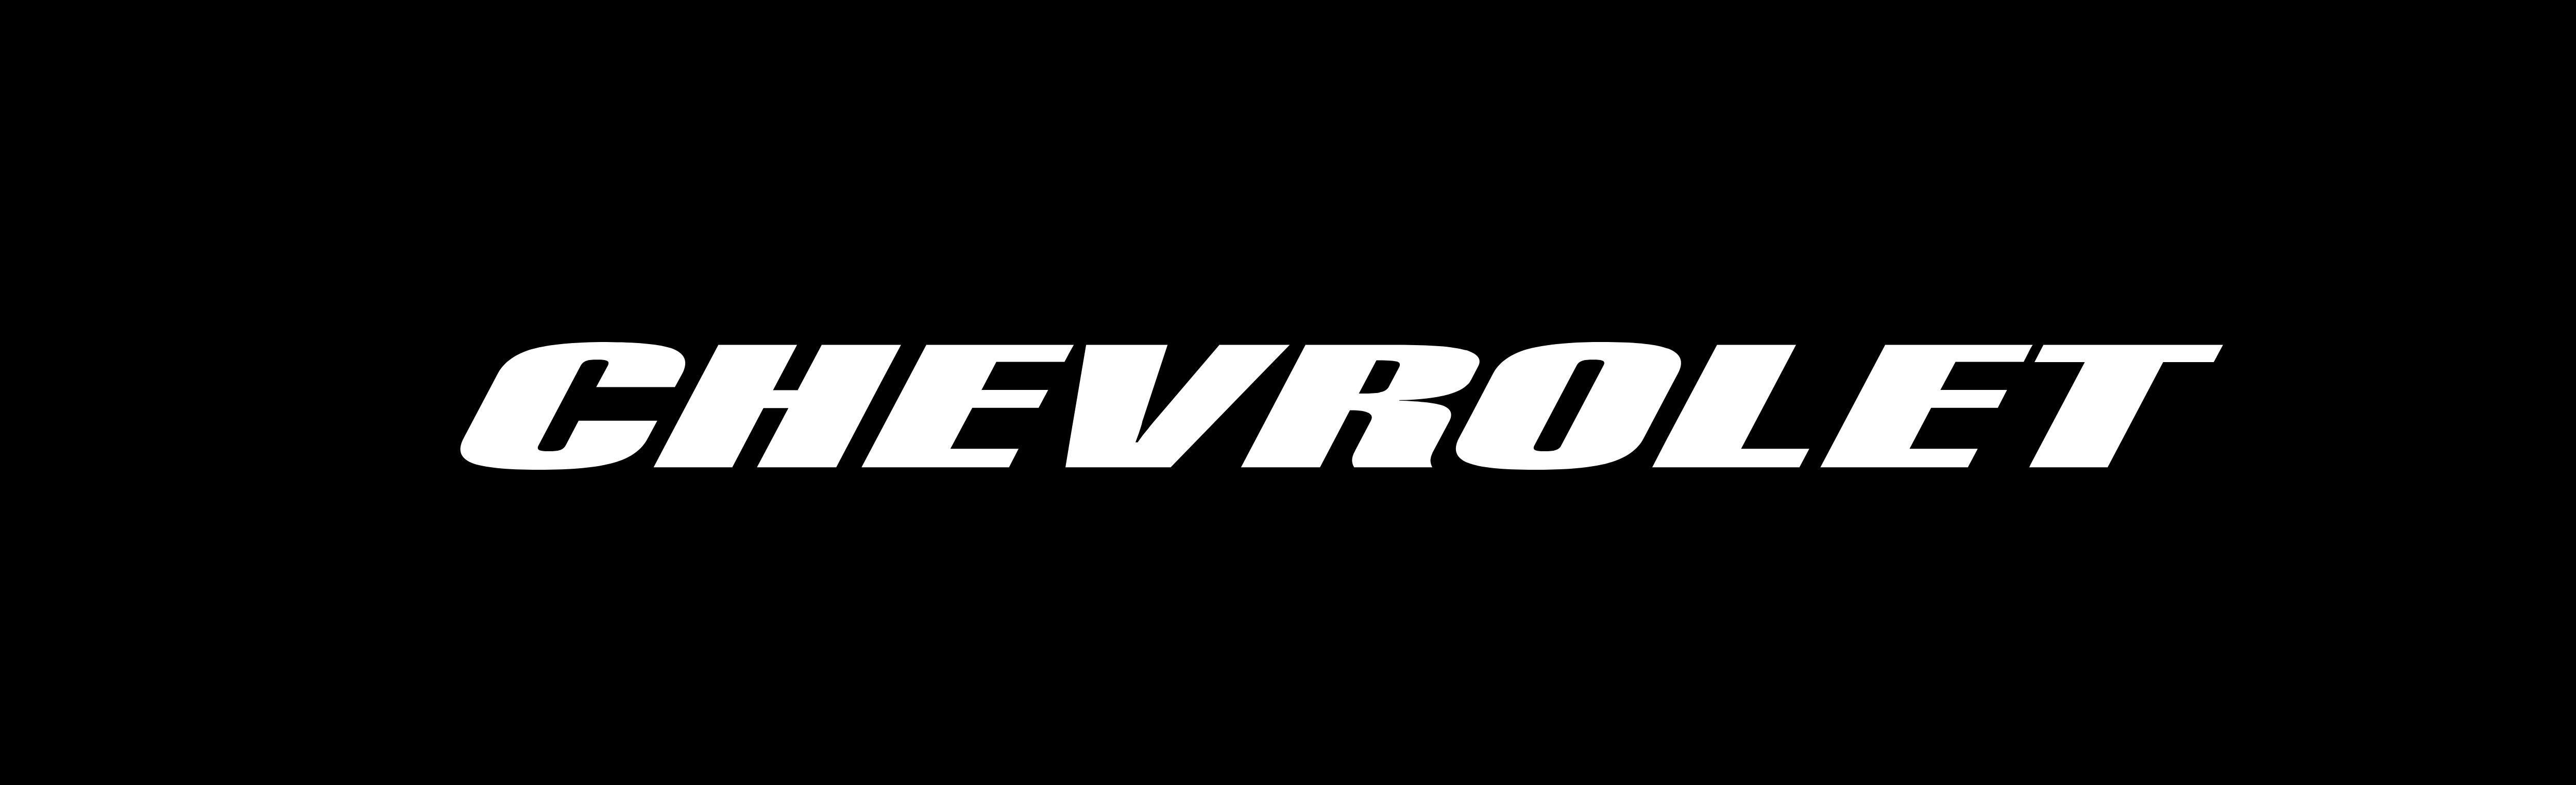 Chevrolet Logos Download Chevrolet Logo Logos Chevrolet Emblem